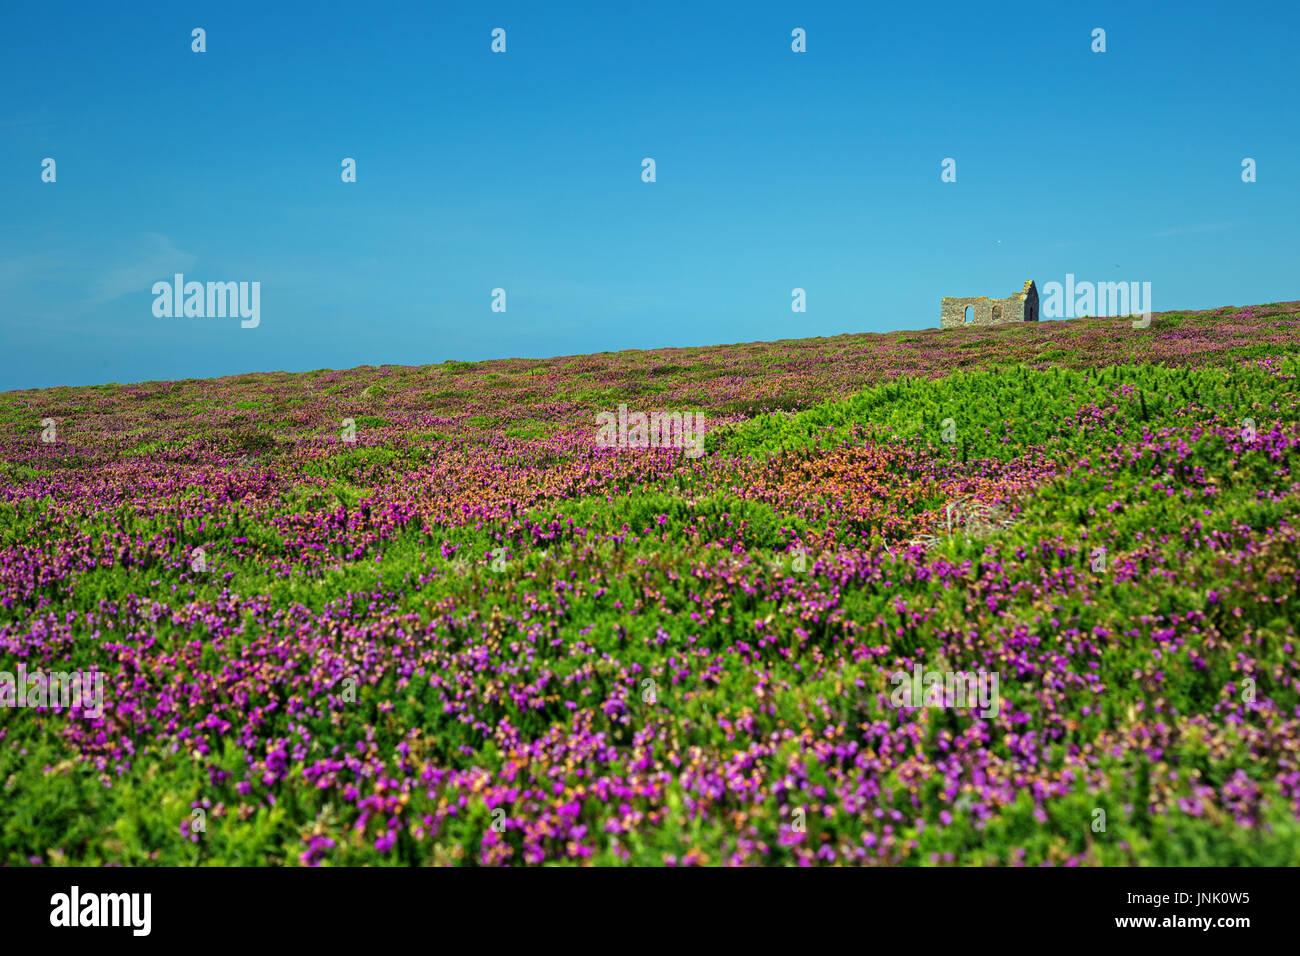 Cornish heather landscape near the Atlantic Ocean - Stock Image